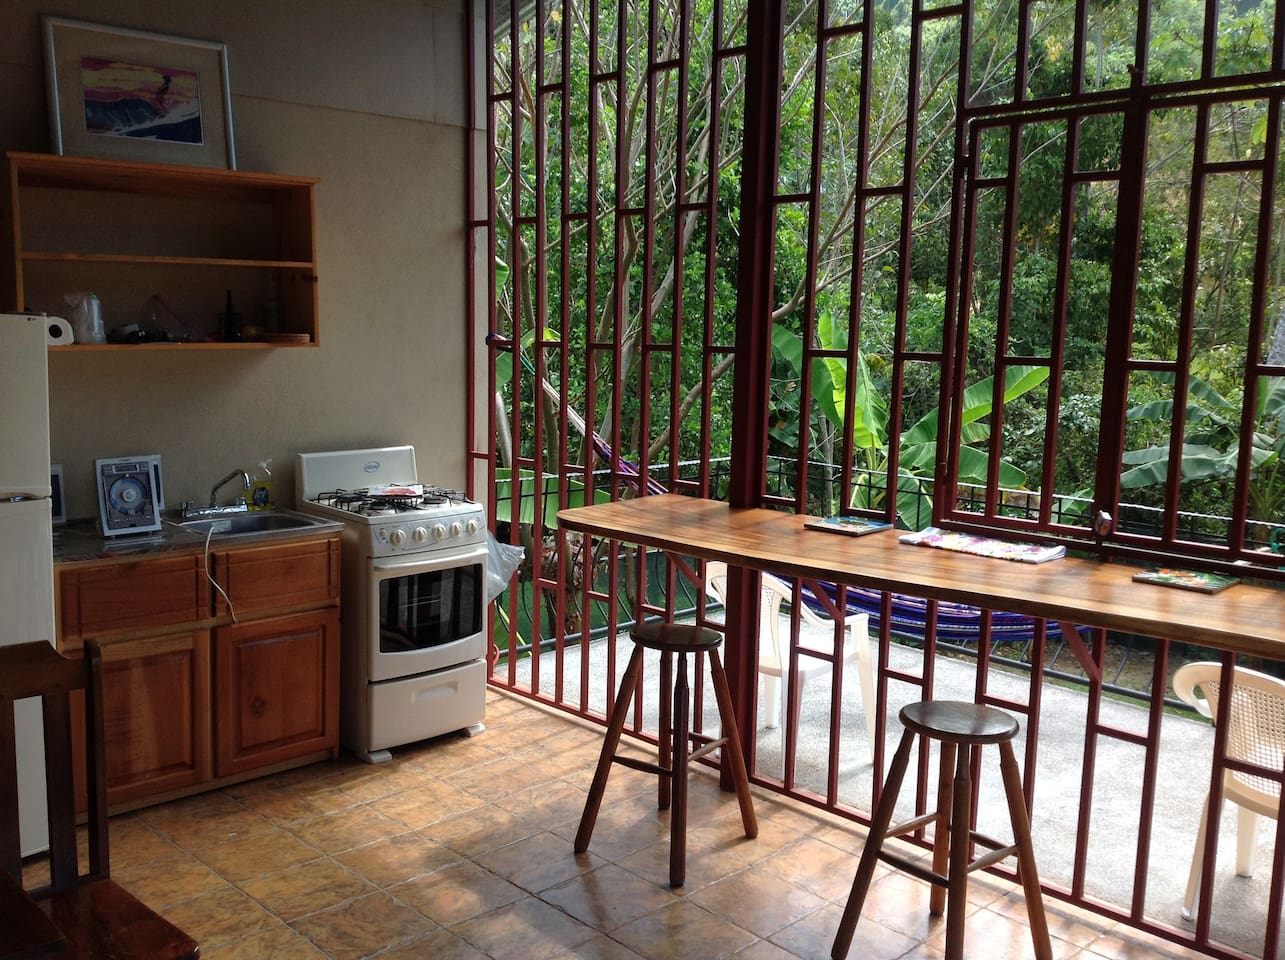 upstairs Kitchen view